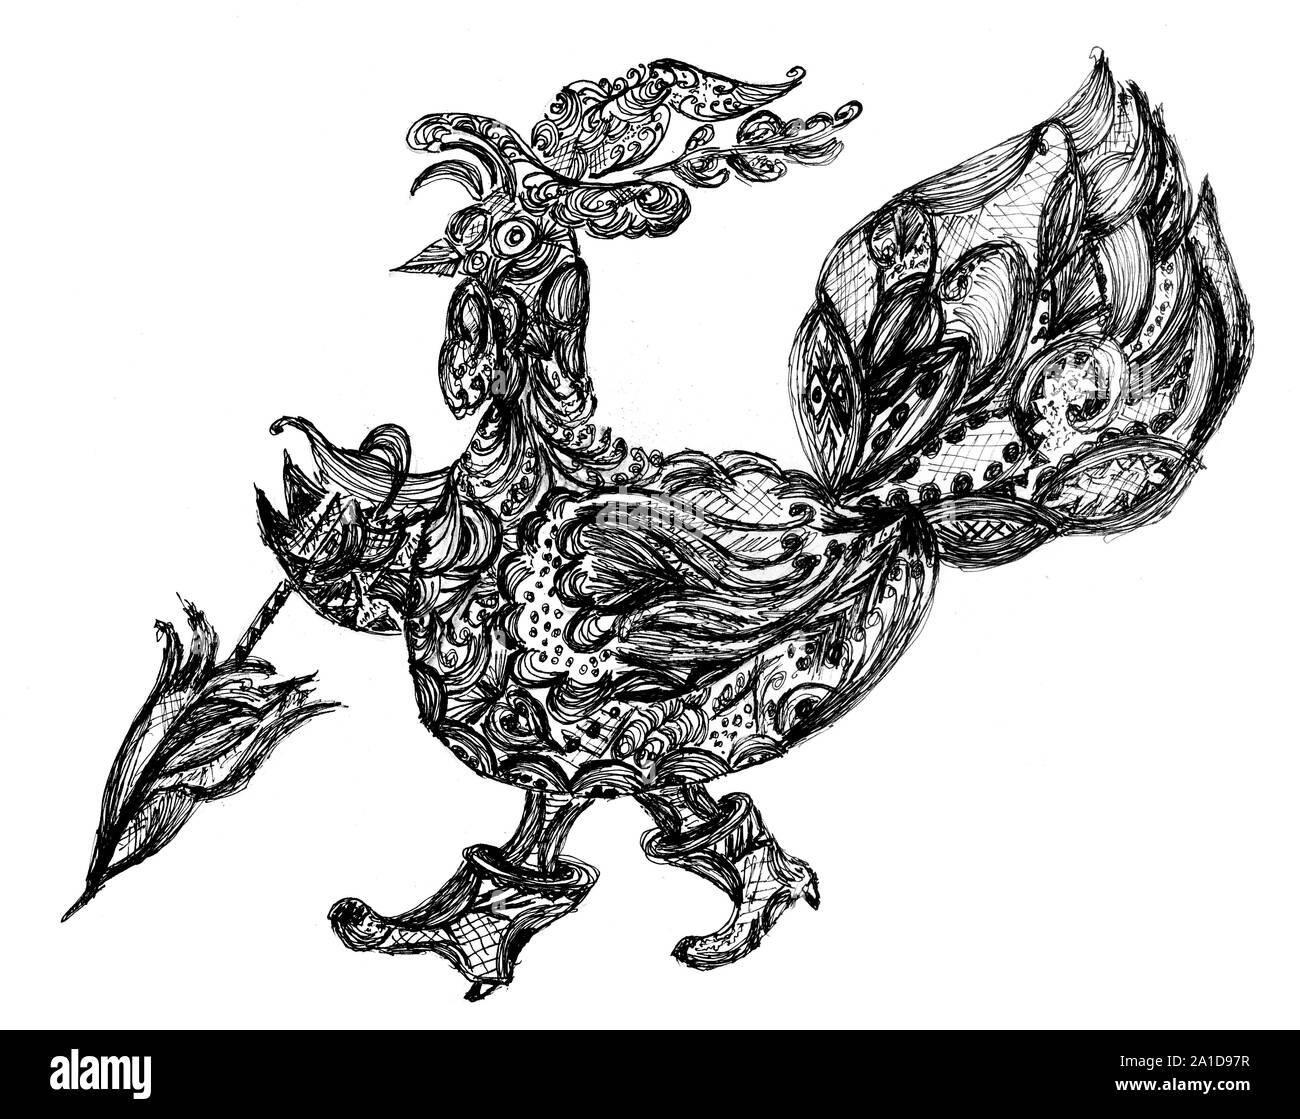 Ornamental stylized thanksgiving turkey bird, black and white. Stock Photo